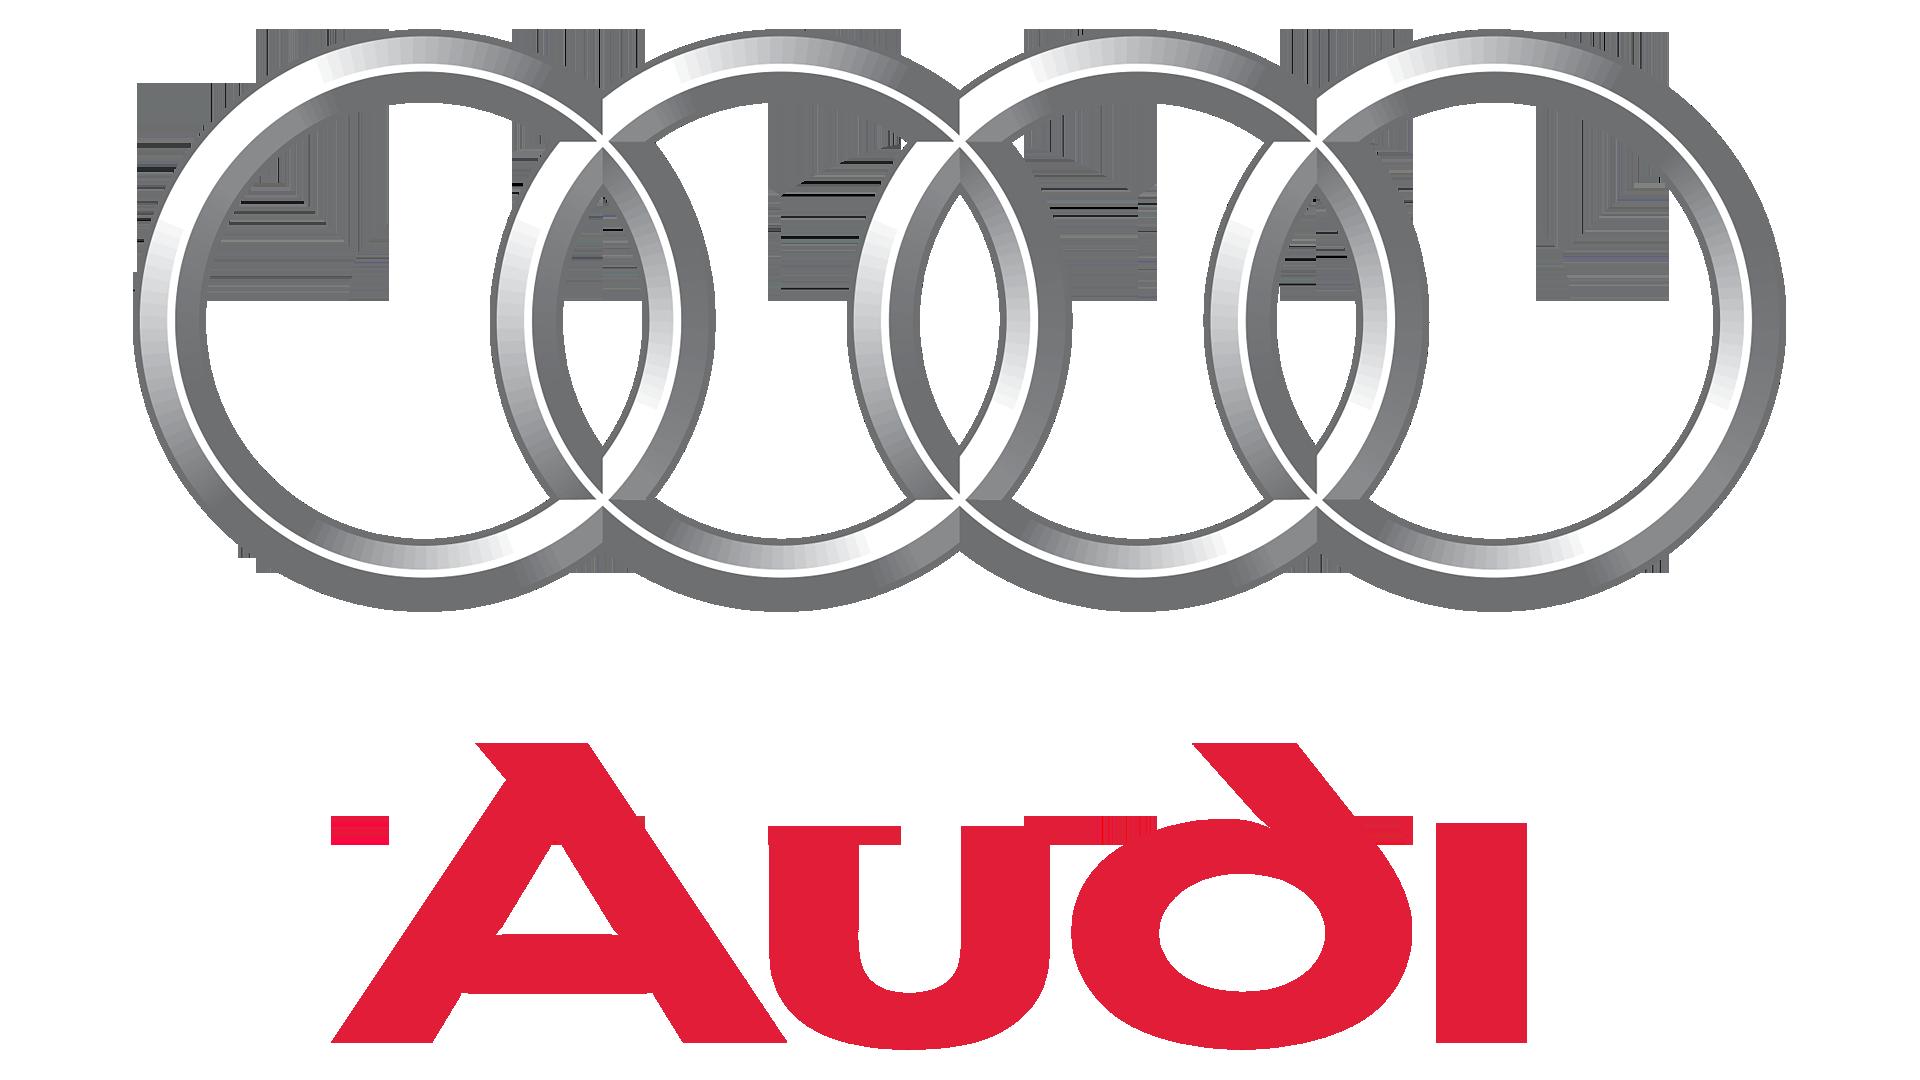 1920x1080 (HD 1080p) - Audi PNG